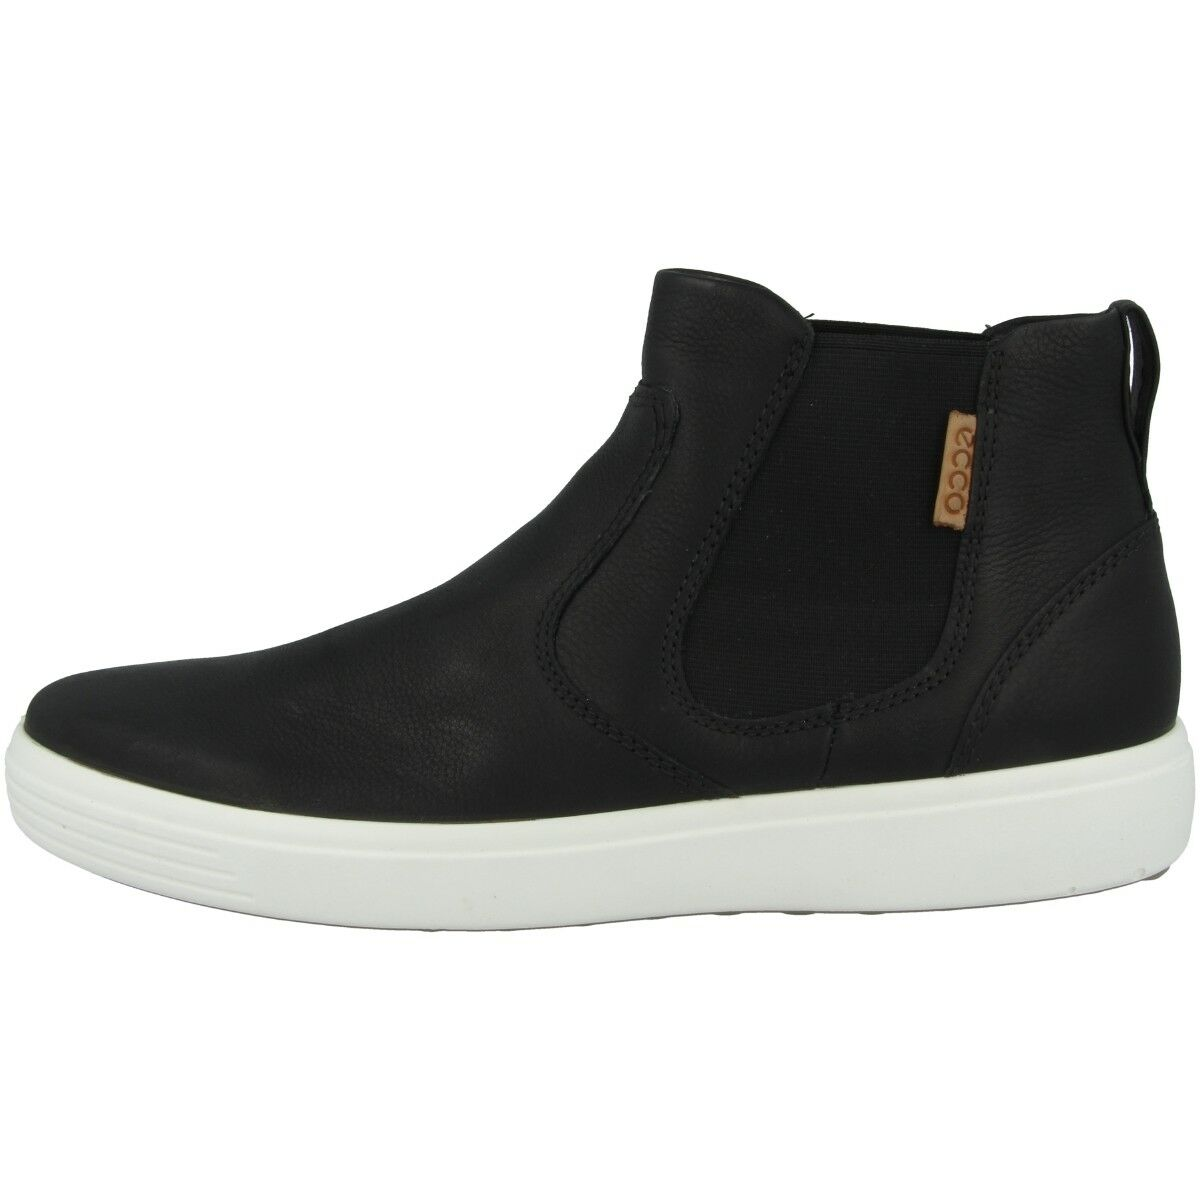 Ecco Soft 7 Mid Cut Schuhe Men Herren Leder Turnschuhe High Top Stiefel 430124-59075